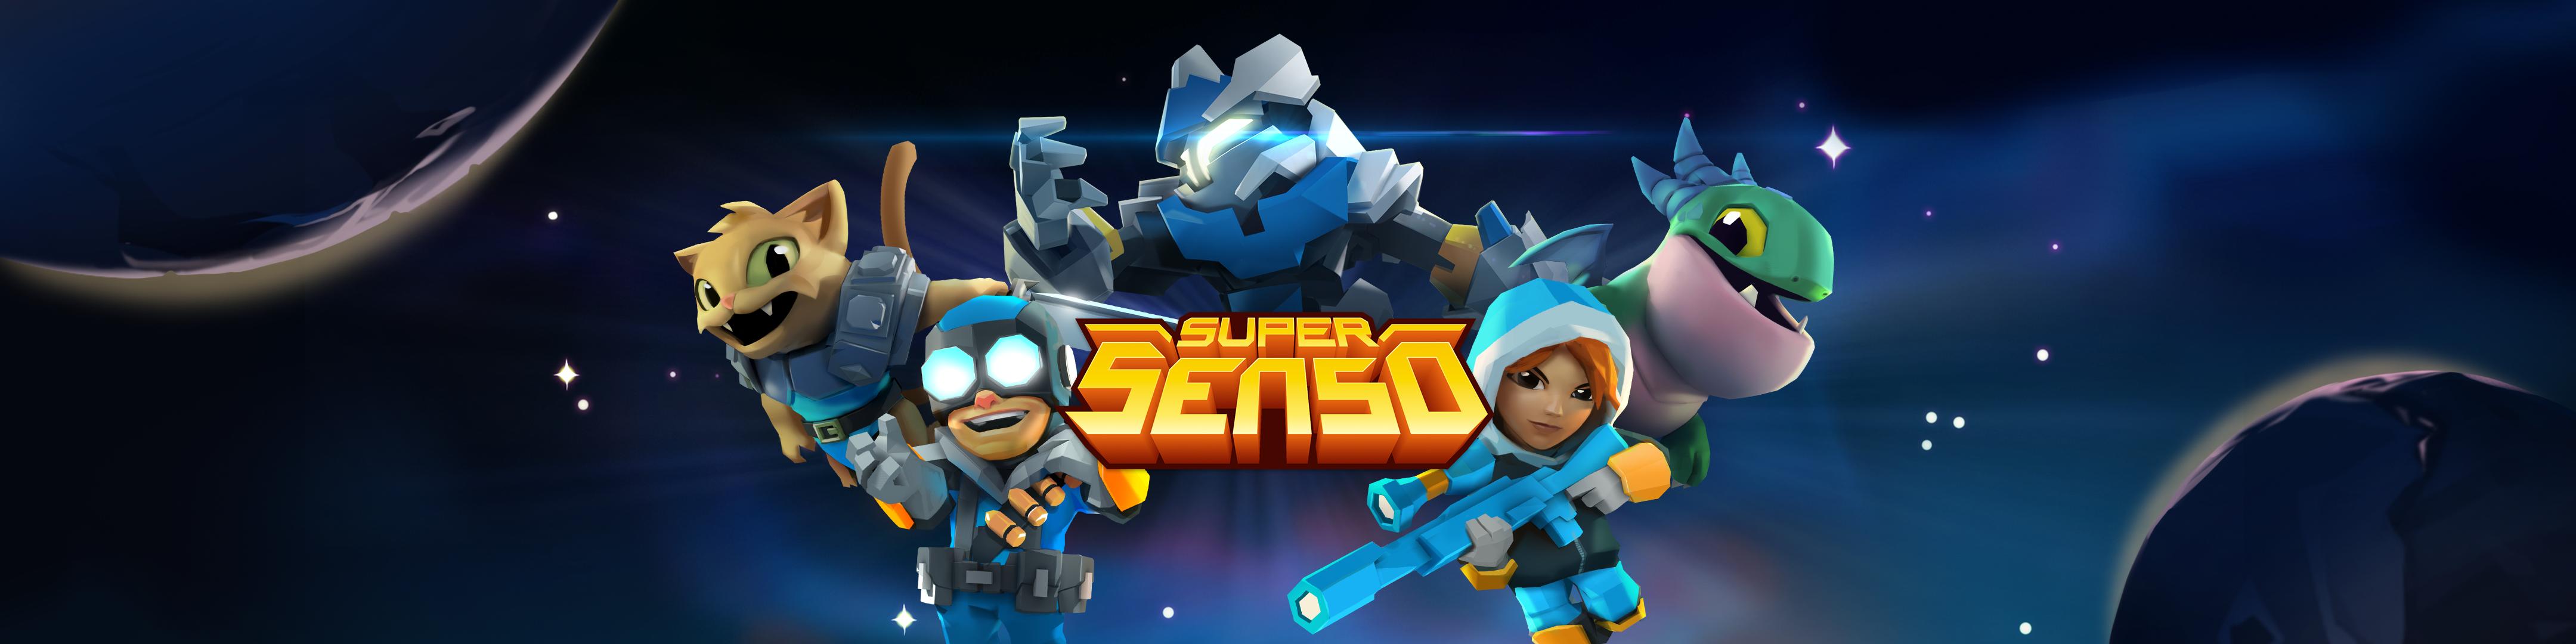 Super Senso